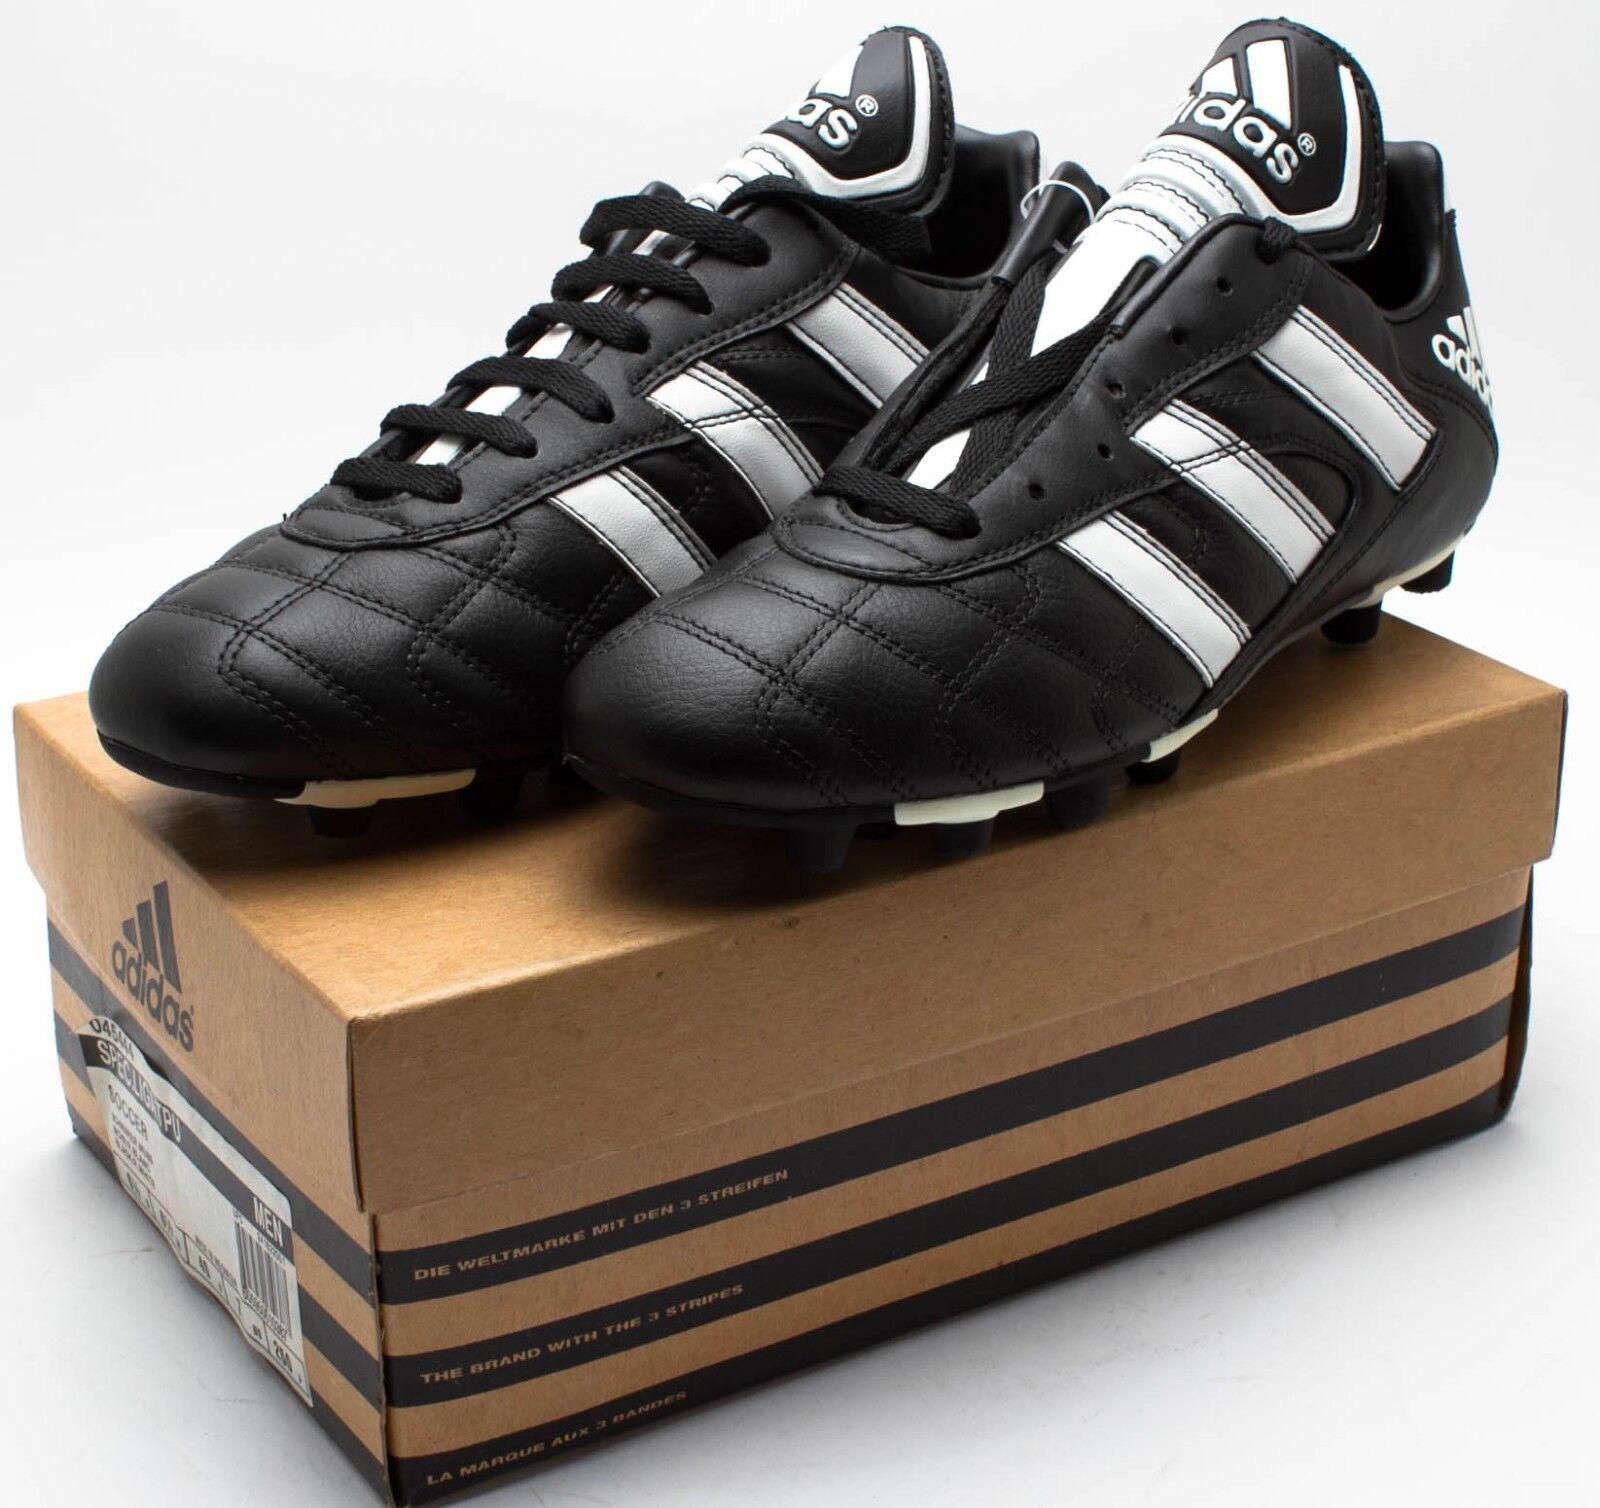 Adidas Men's Vintage 1999 Spec.Liga TPU Soccer Shoes 045444 Black/White 7 8 8.5